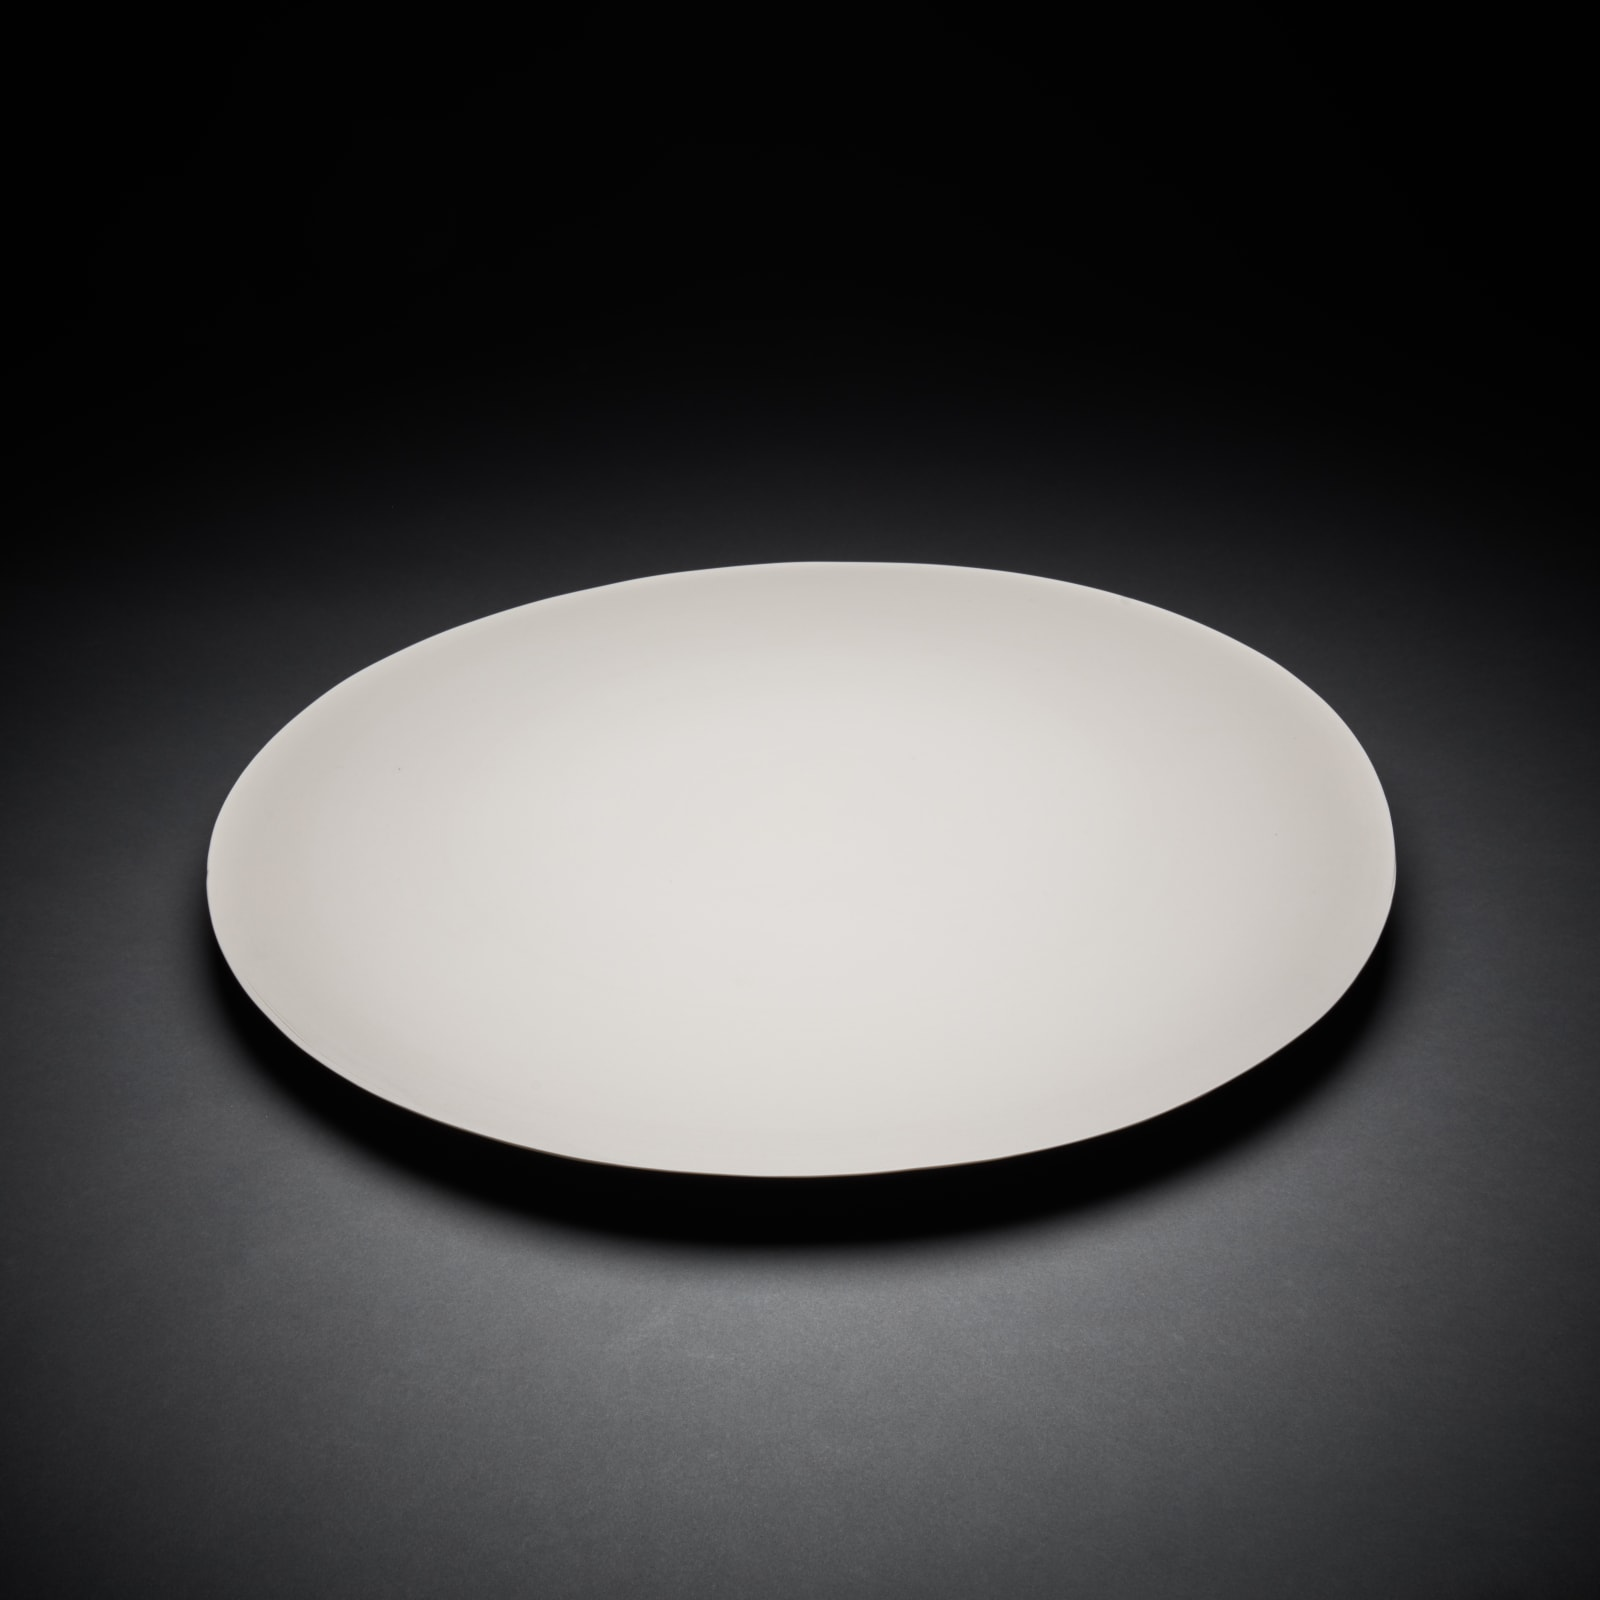 Taizo Kuroda, Untitled 90 (Flat Dai-Sara I), 2018